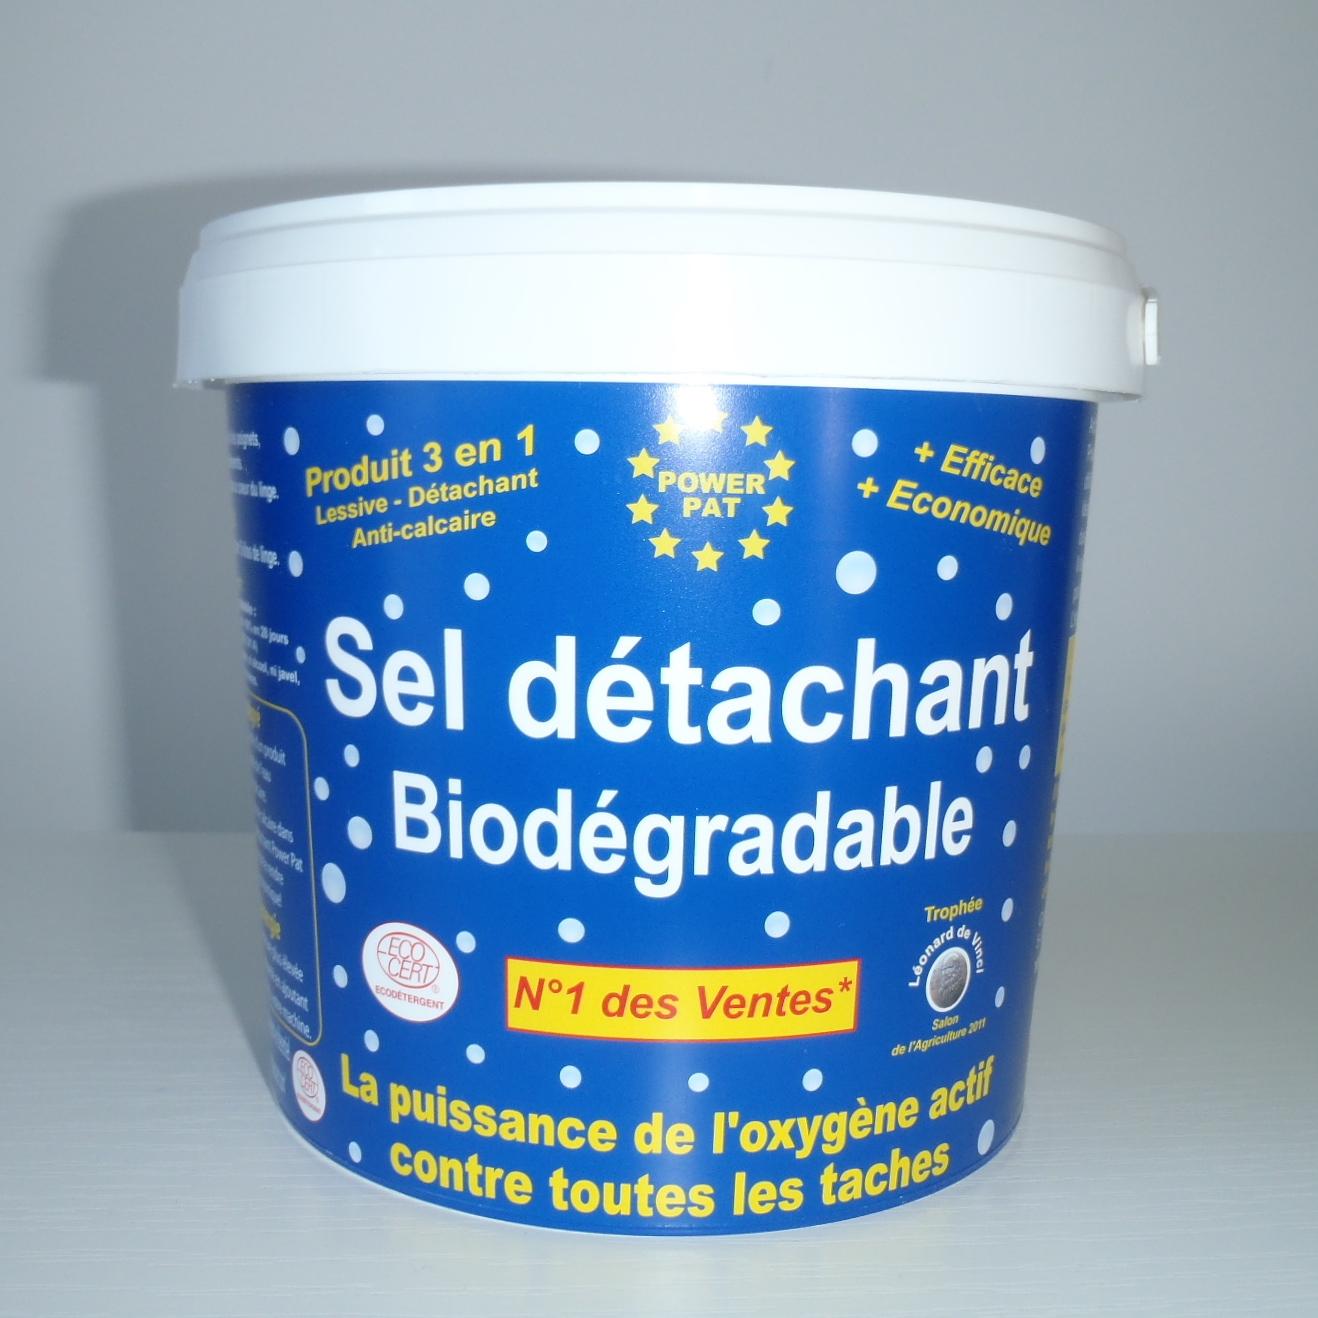 Sel detachant biodegradable – 12kg